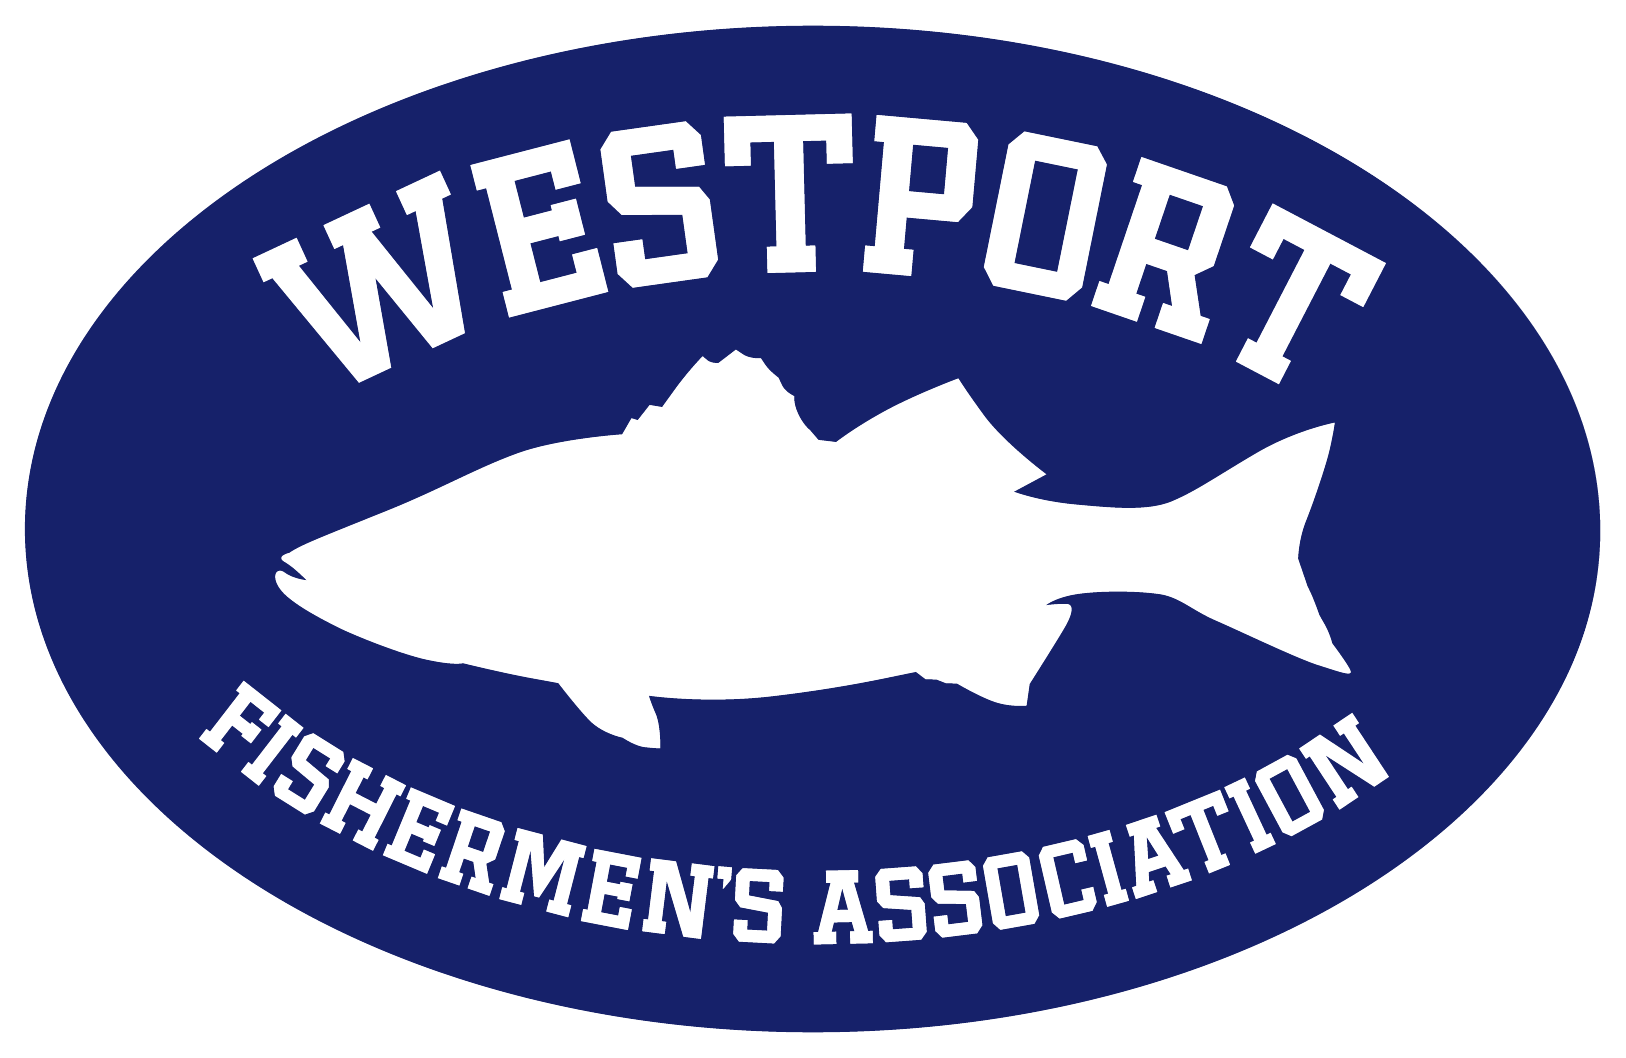 Westport fishermen's association logo